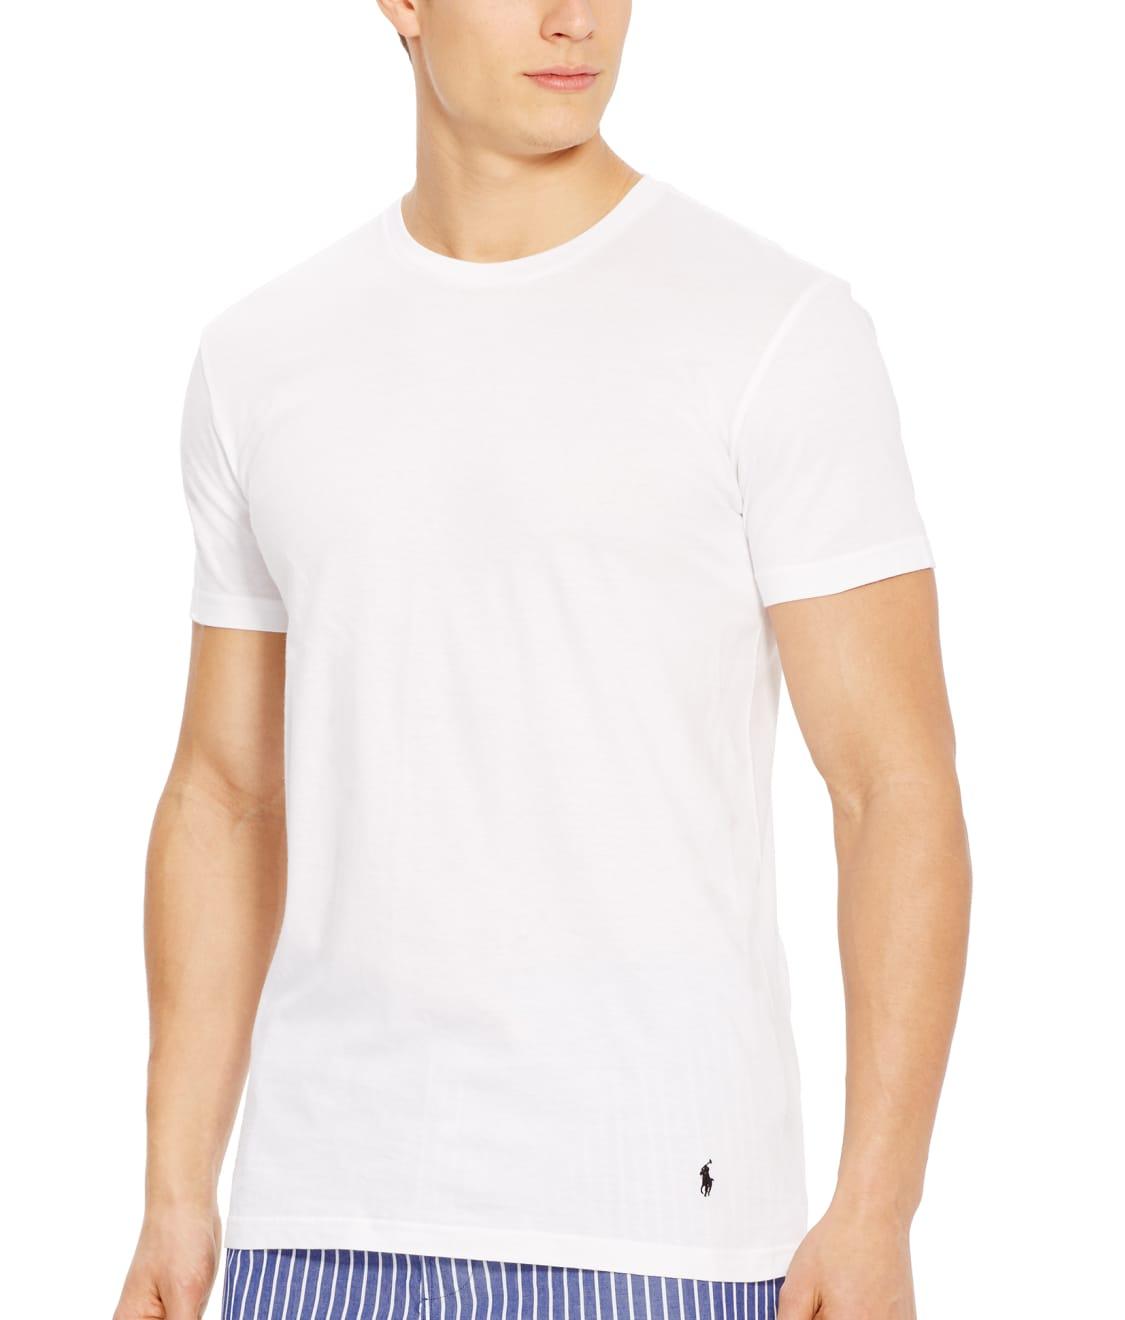 Polo Ralph Lauren Classic Crew Neck T Shirt 3 Pack Bare